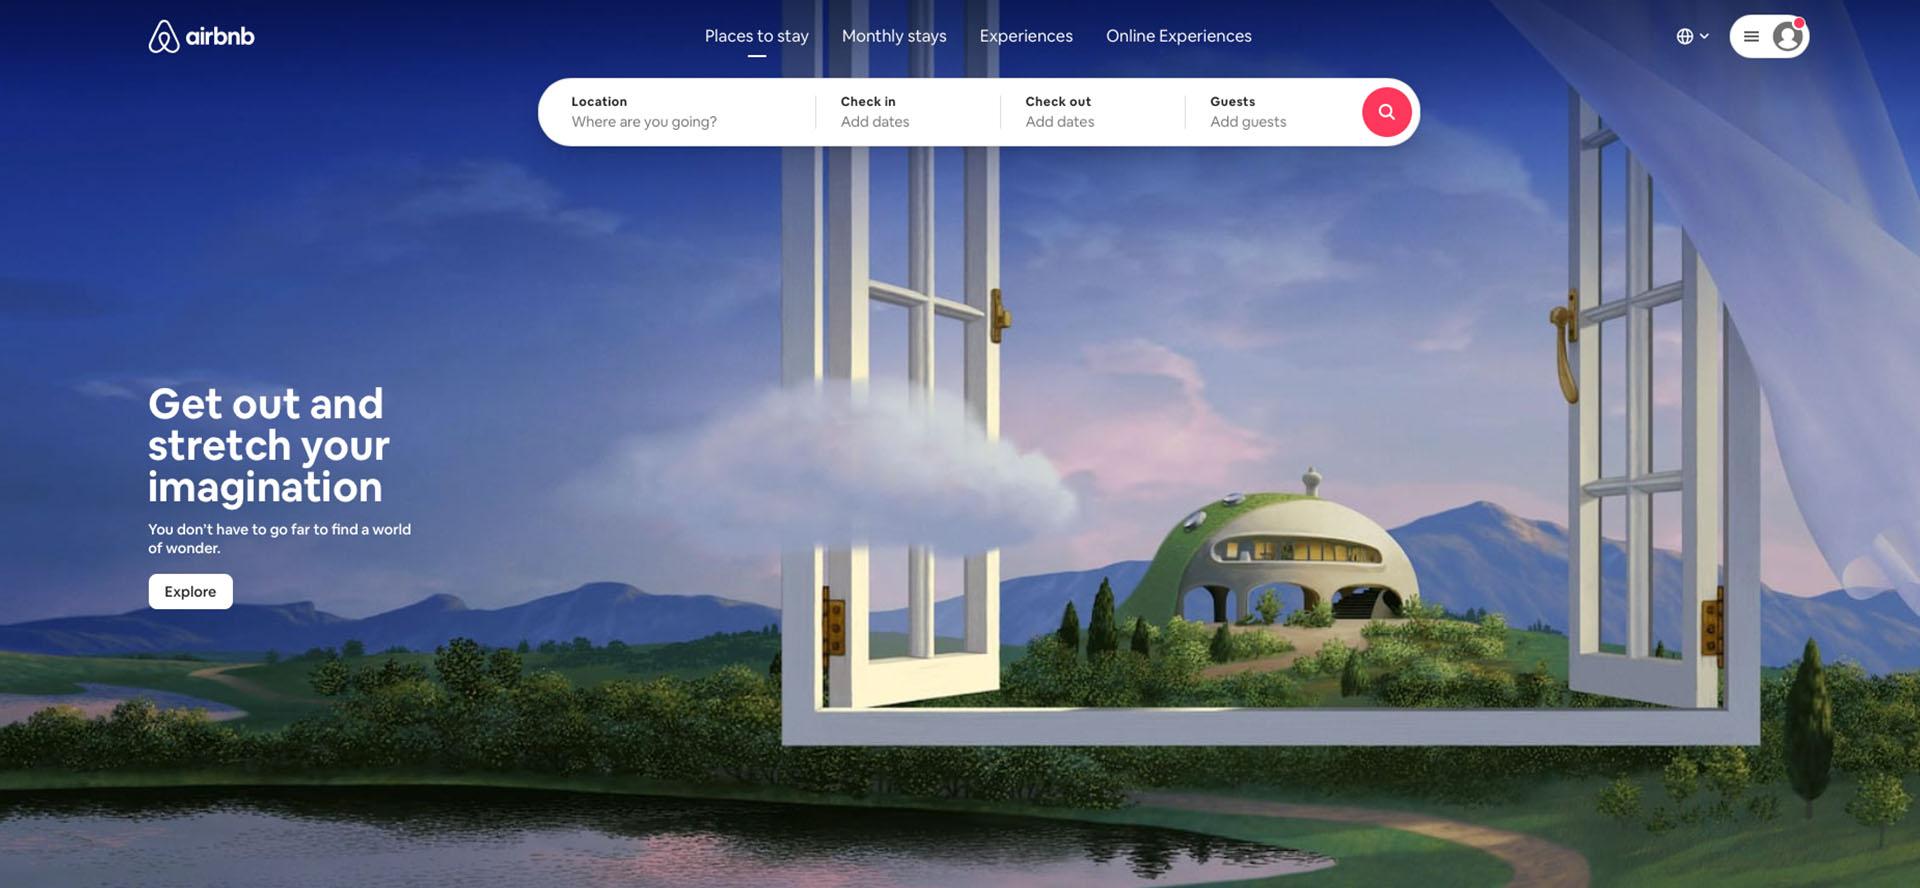 Airbnb website design example